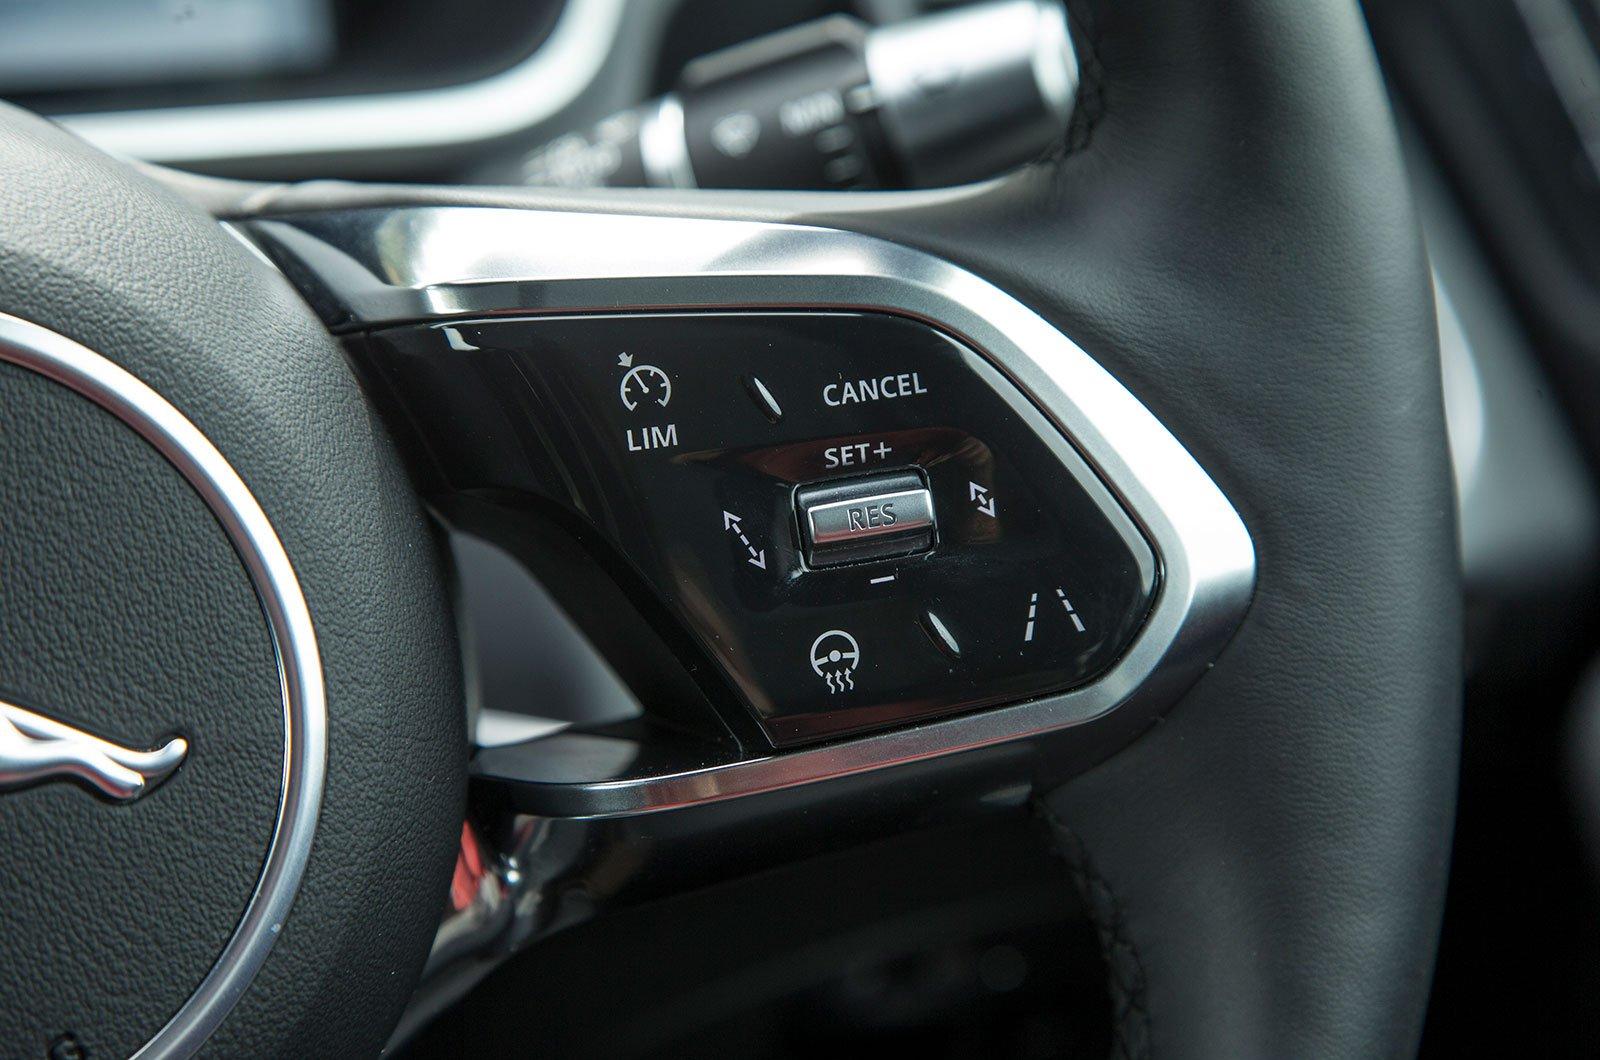 Jaguar Drive Assist